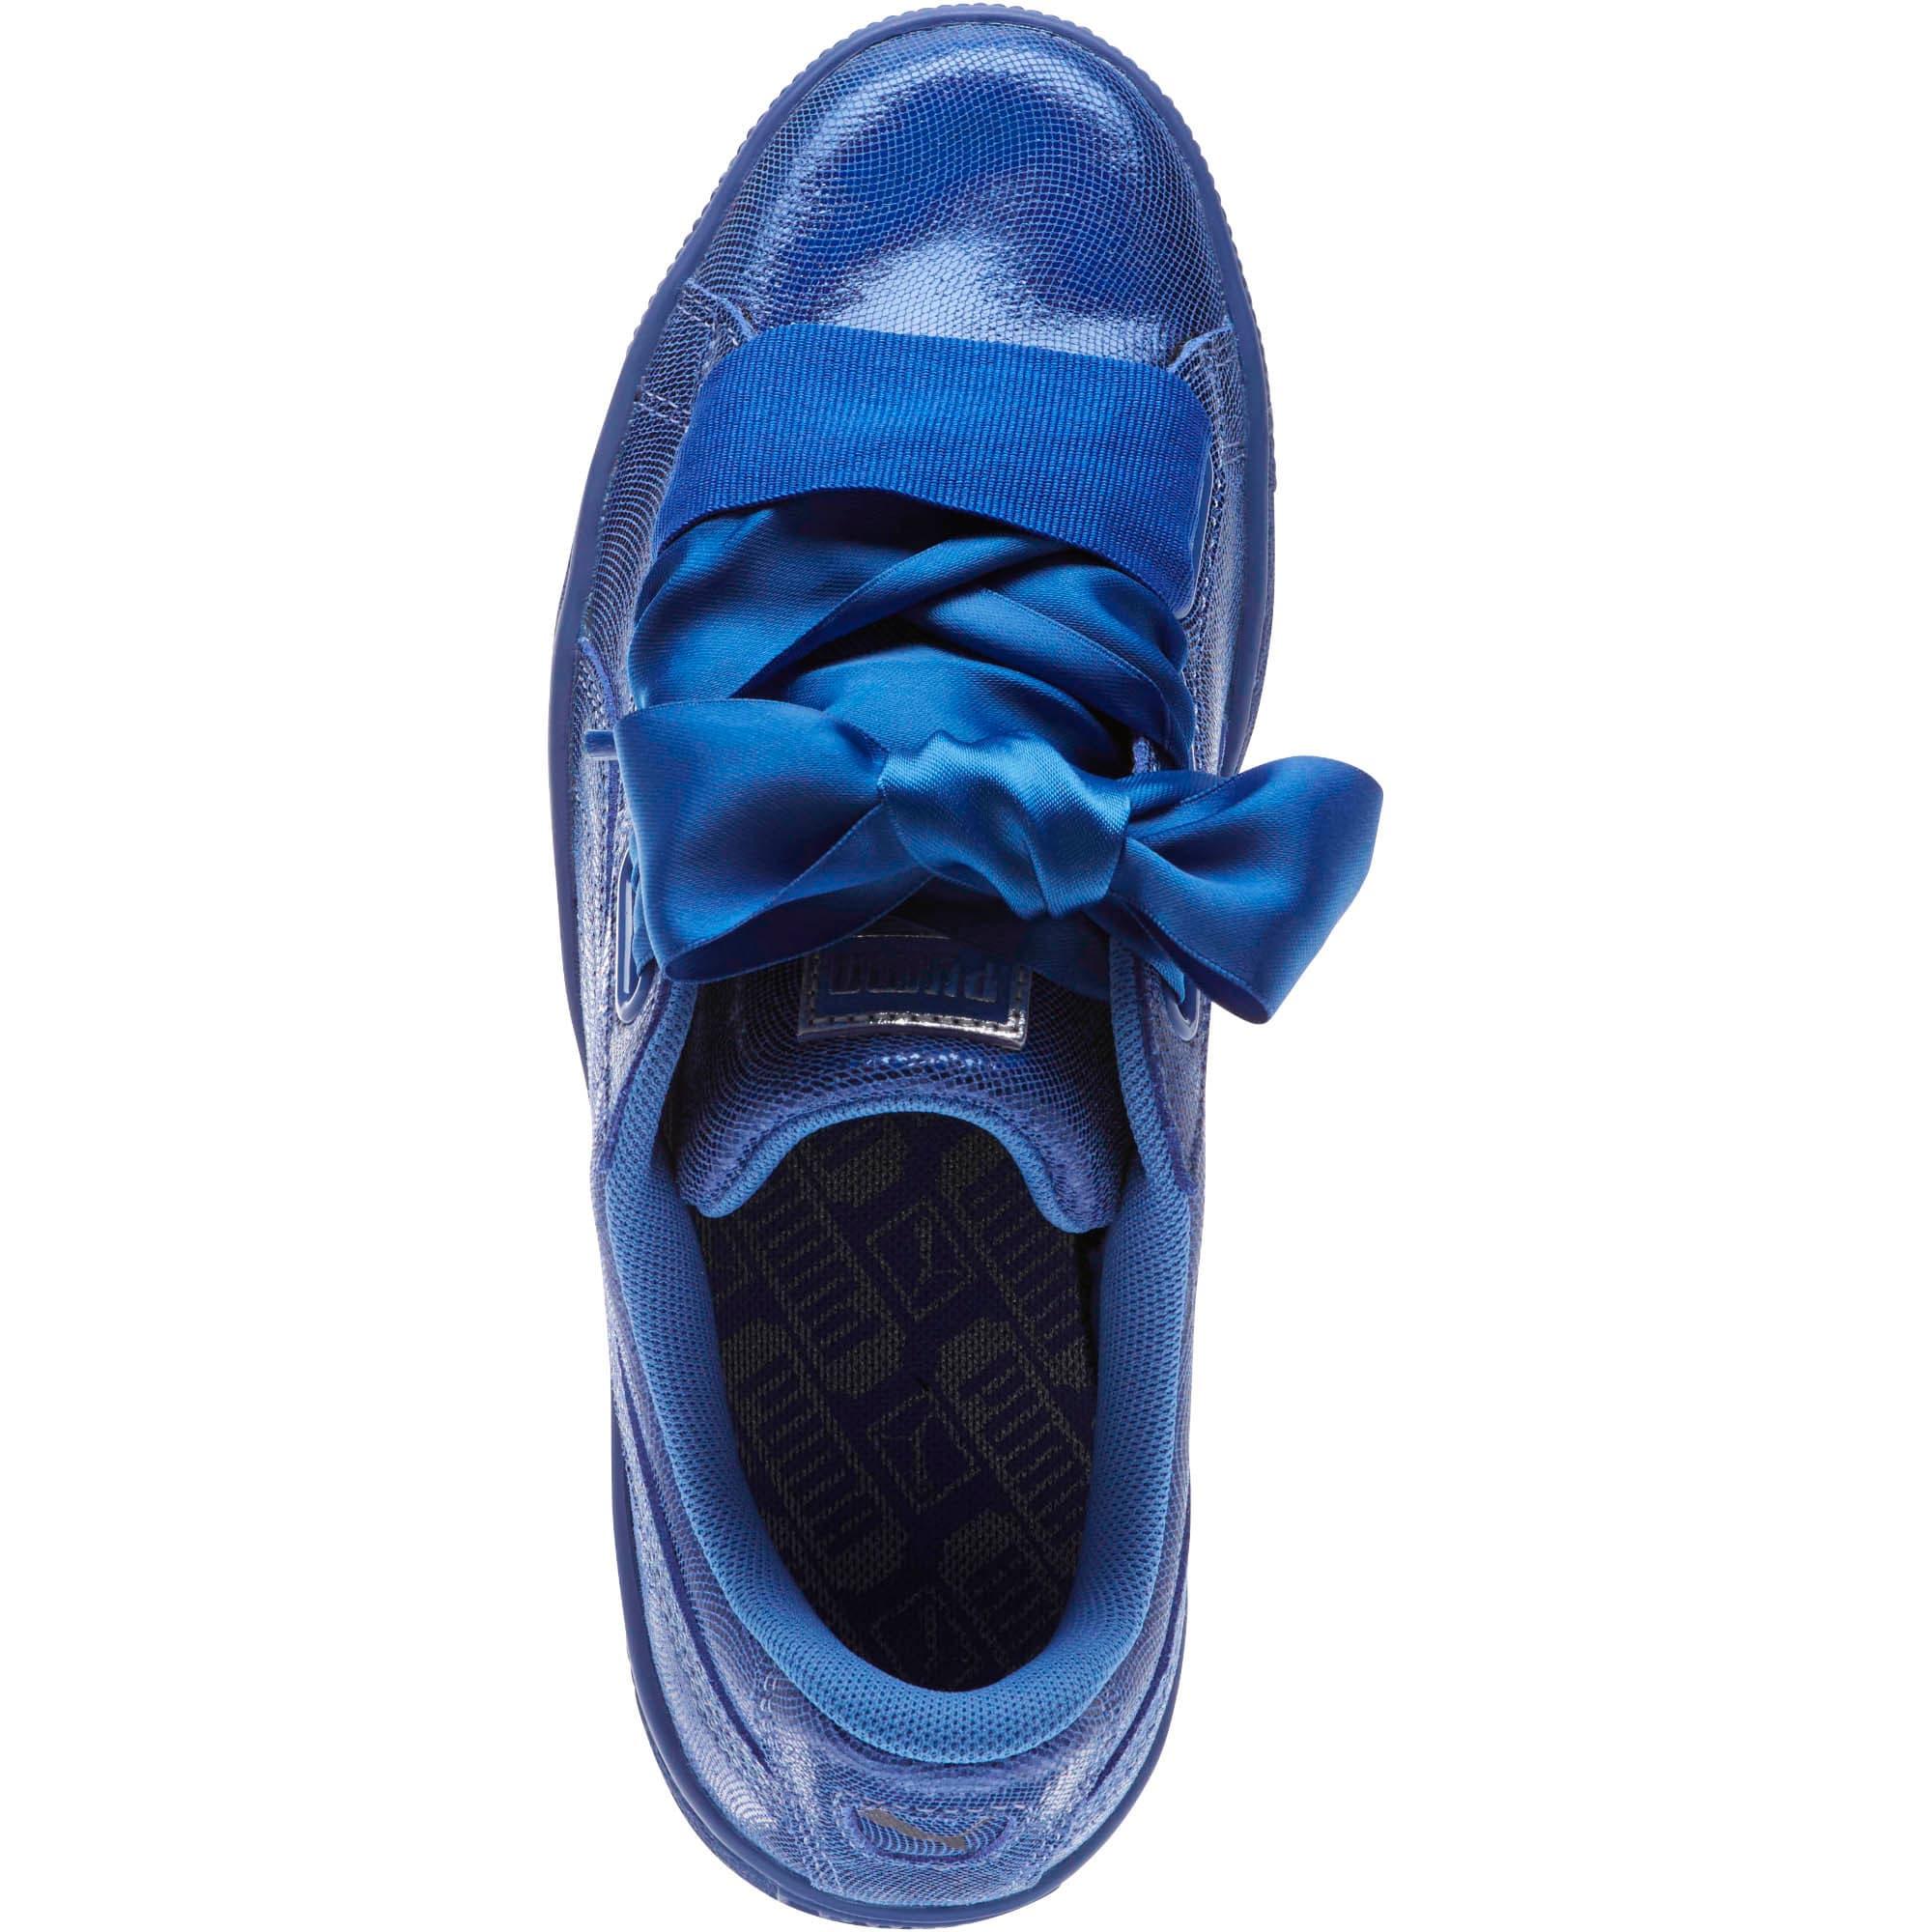 Thumbnail 5 of Basket Heart Opulence Women's Sneakers, Baja Blue-Baja Blue, medium